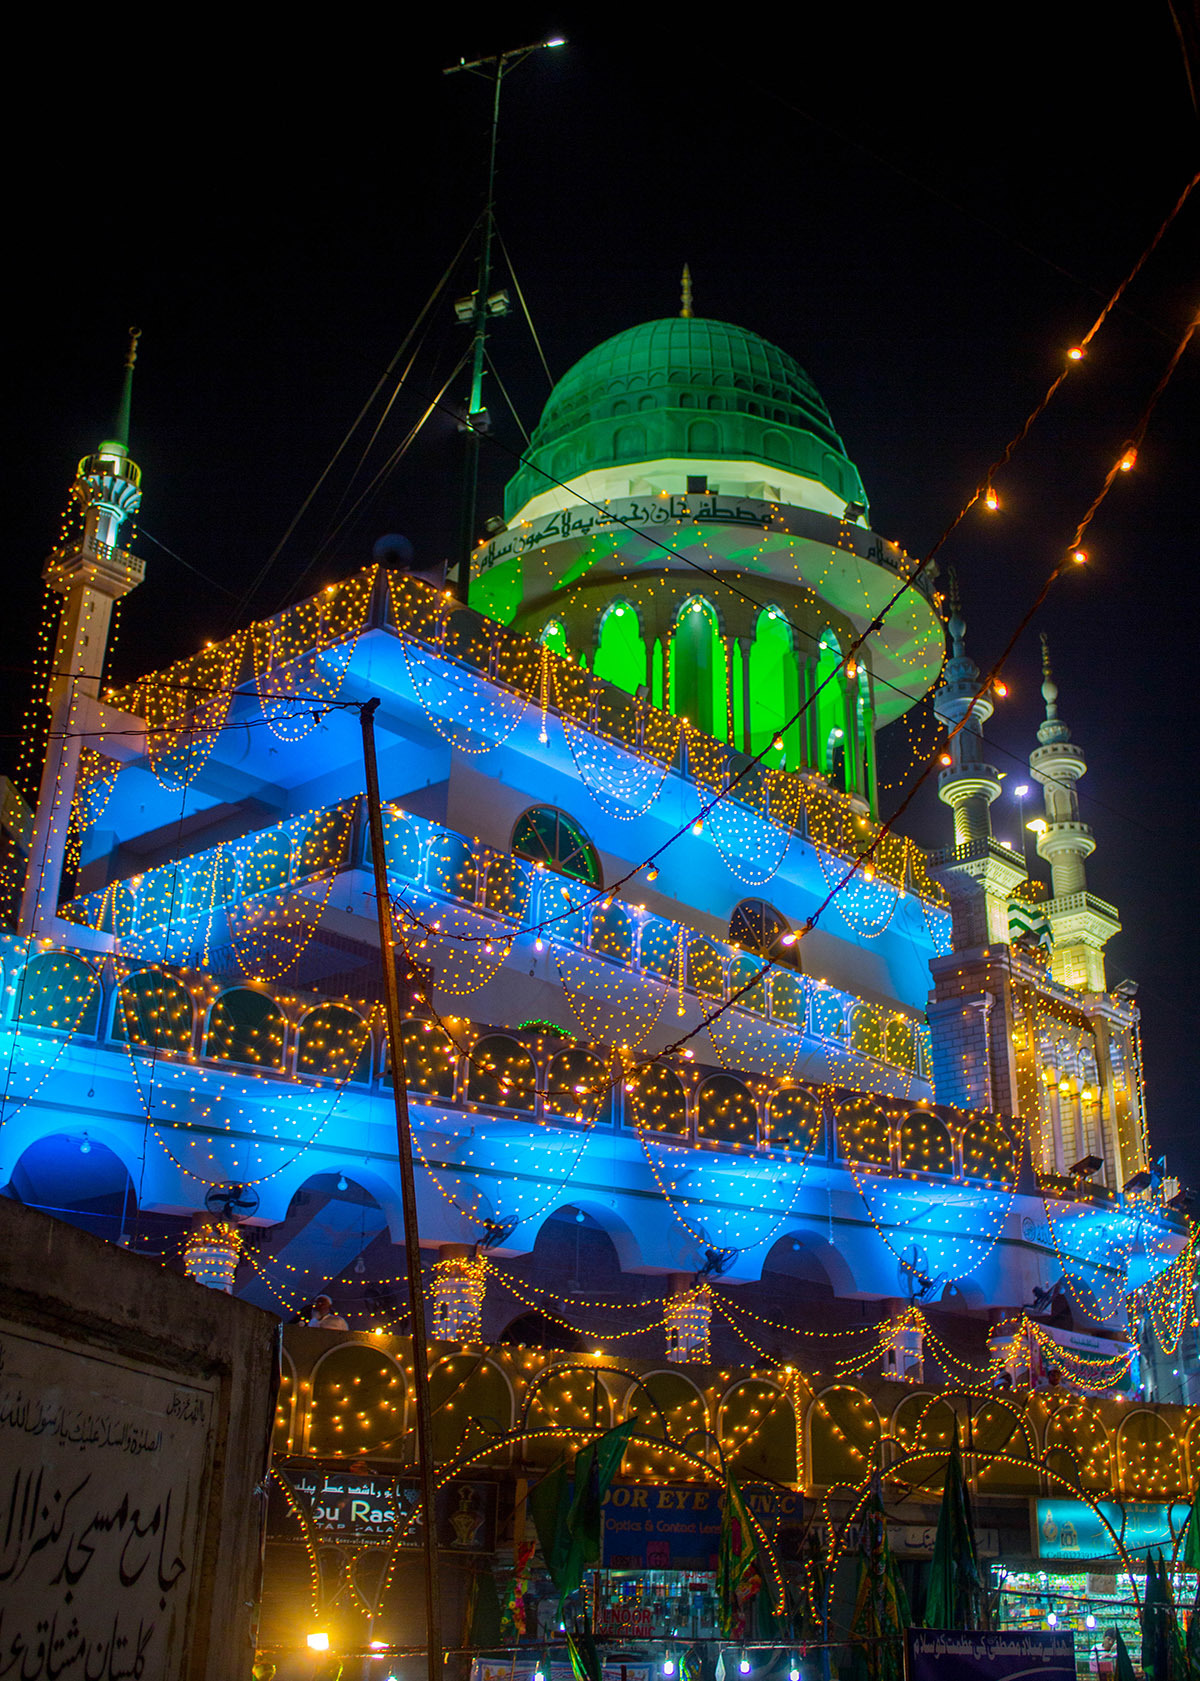 A mosque decorated near Gurumander, Karachi. — Muhammad Umar